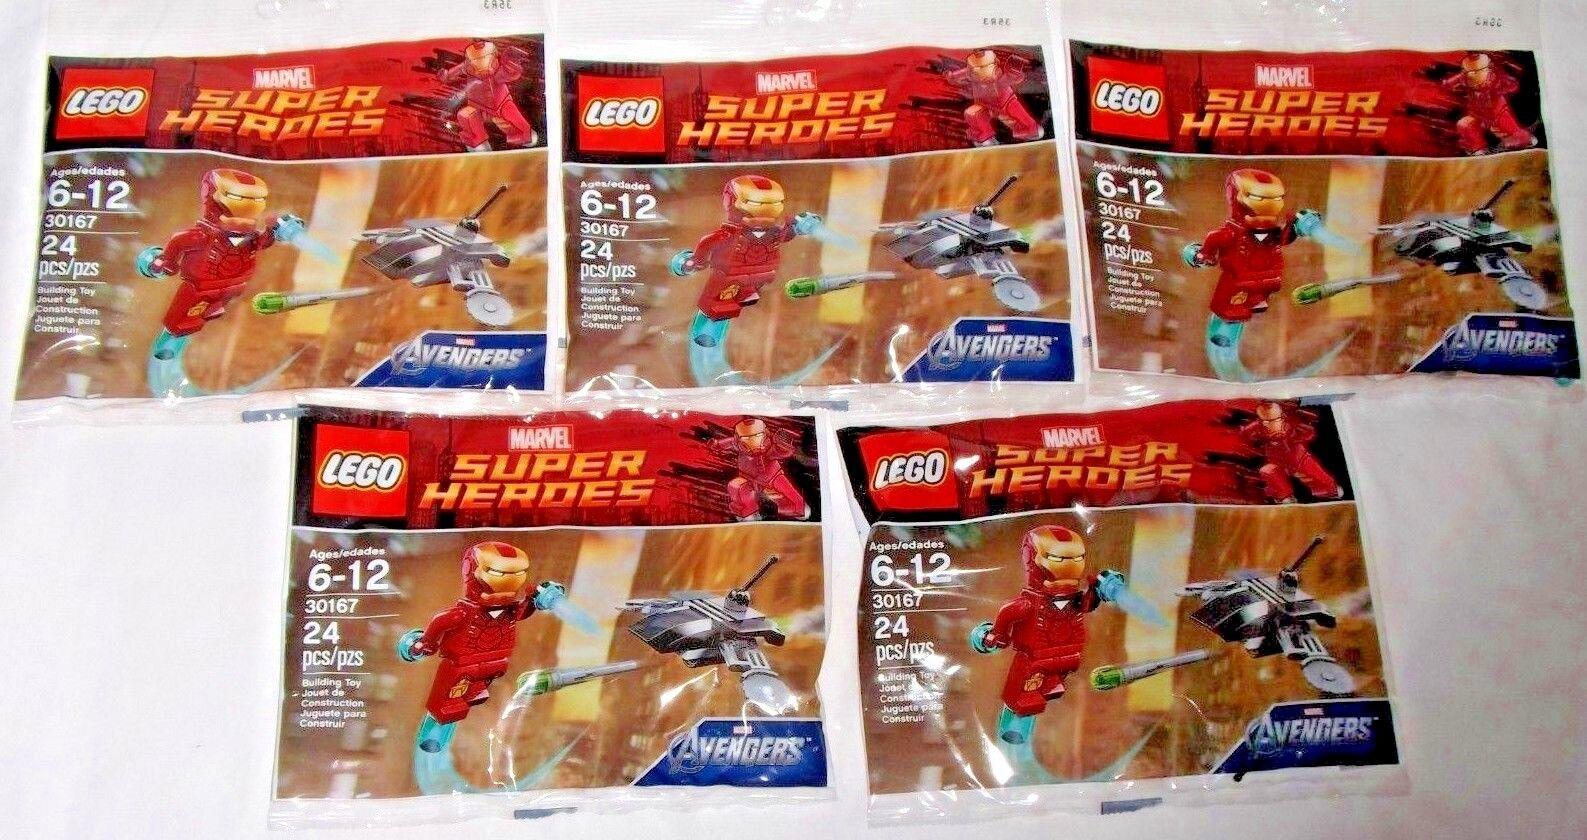 LEGO sealed PROMO POLYBAG Baggie set lot x5 30167 MARVEL Iron Man Fighting Drone